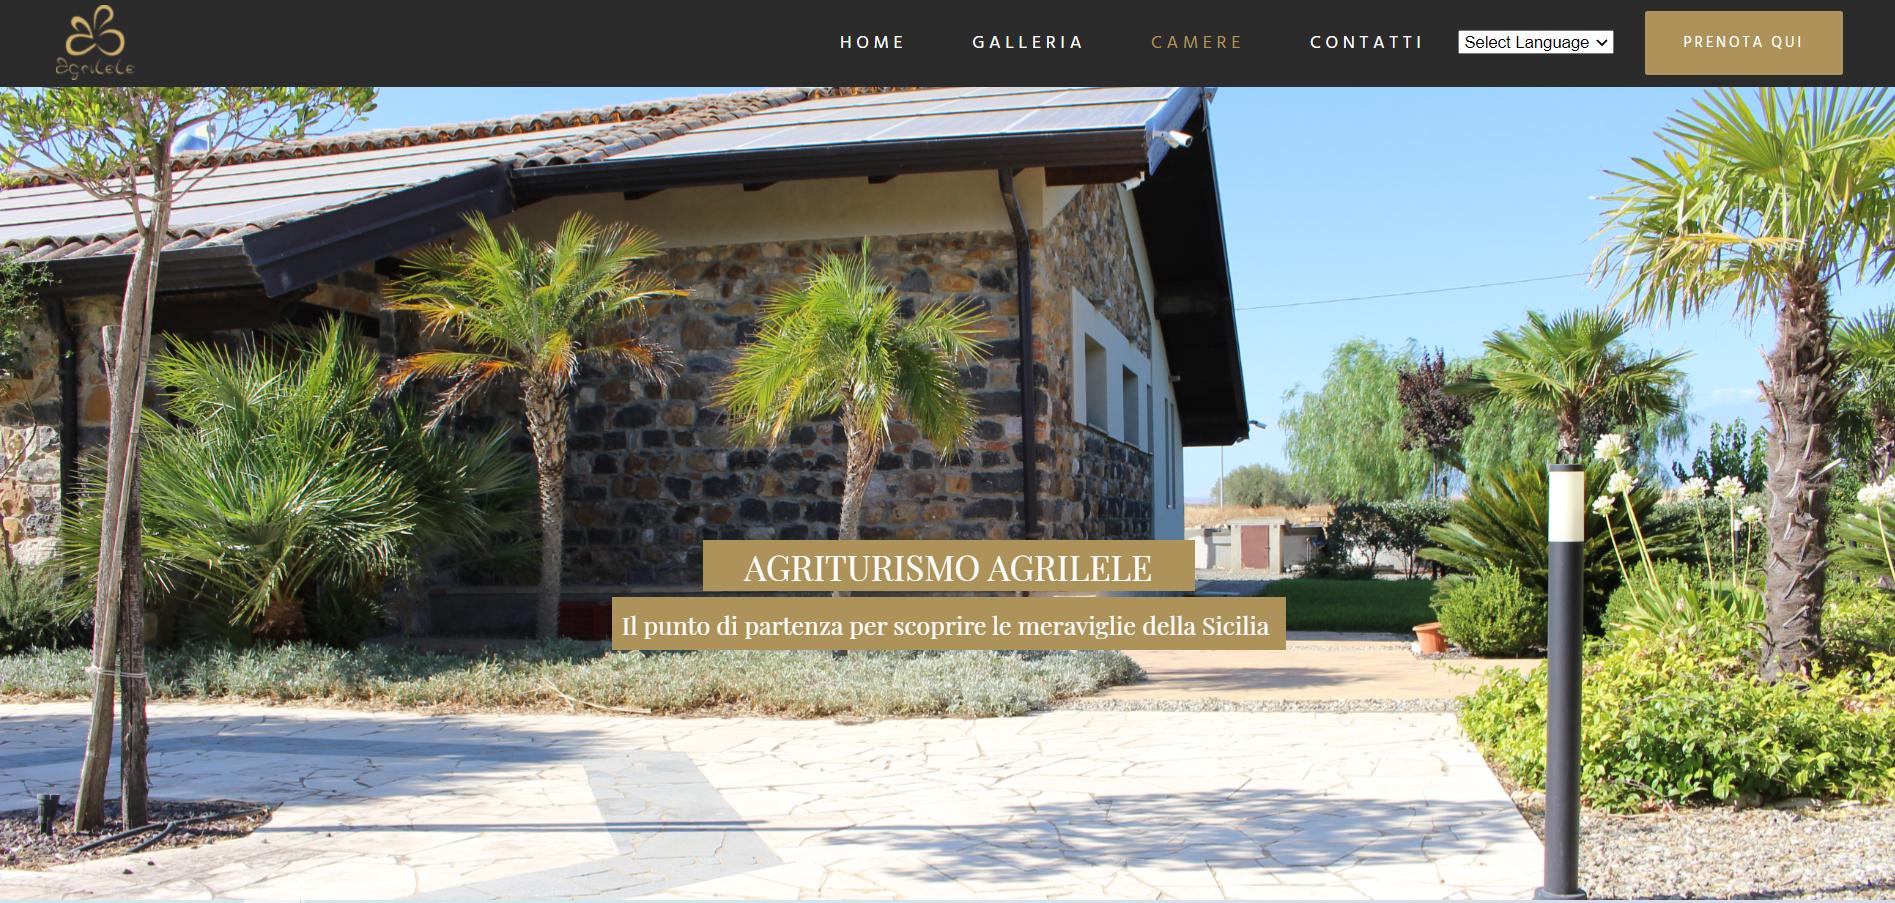 Agrilele agriturismo sito web vetrina